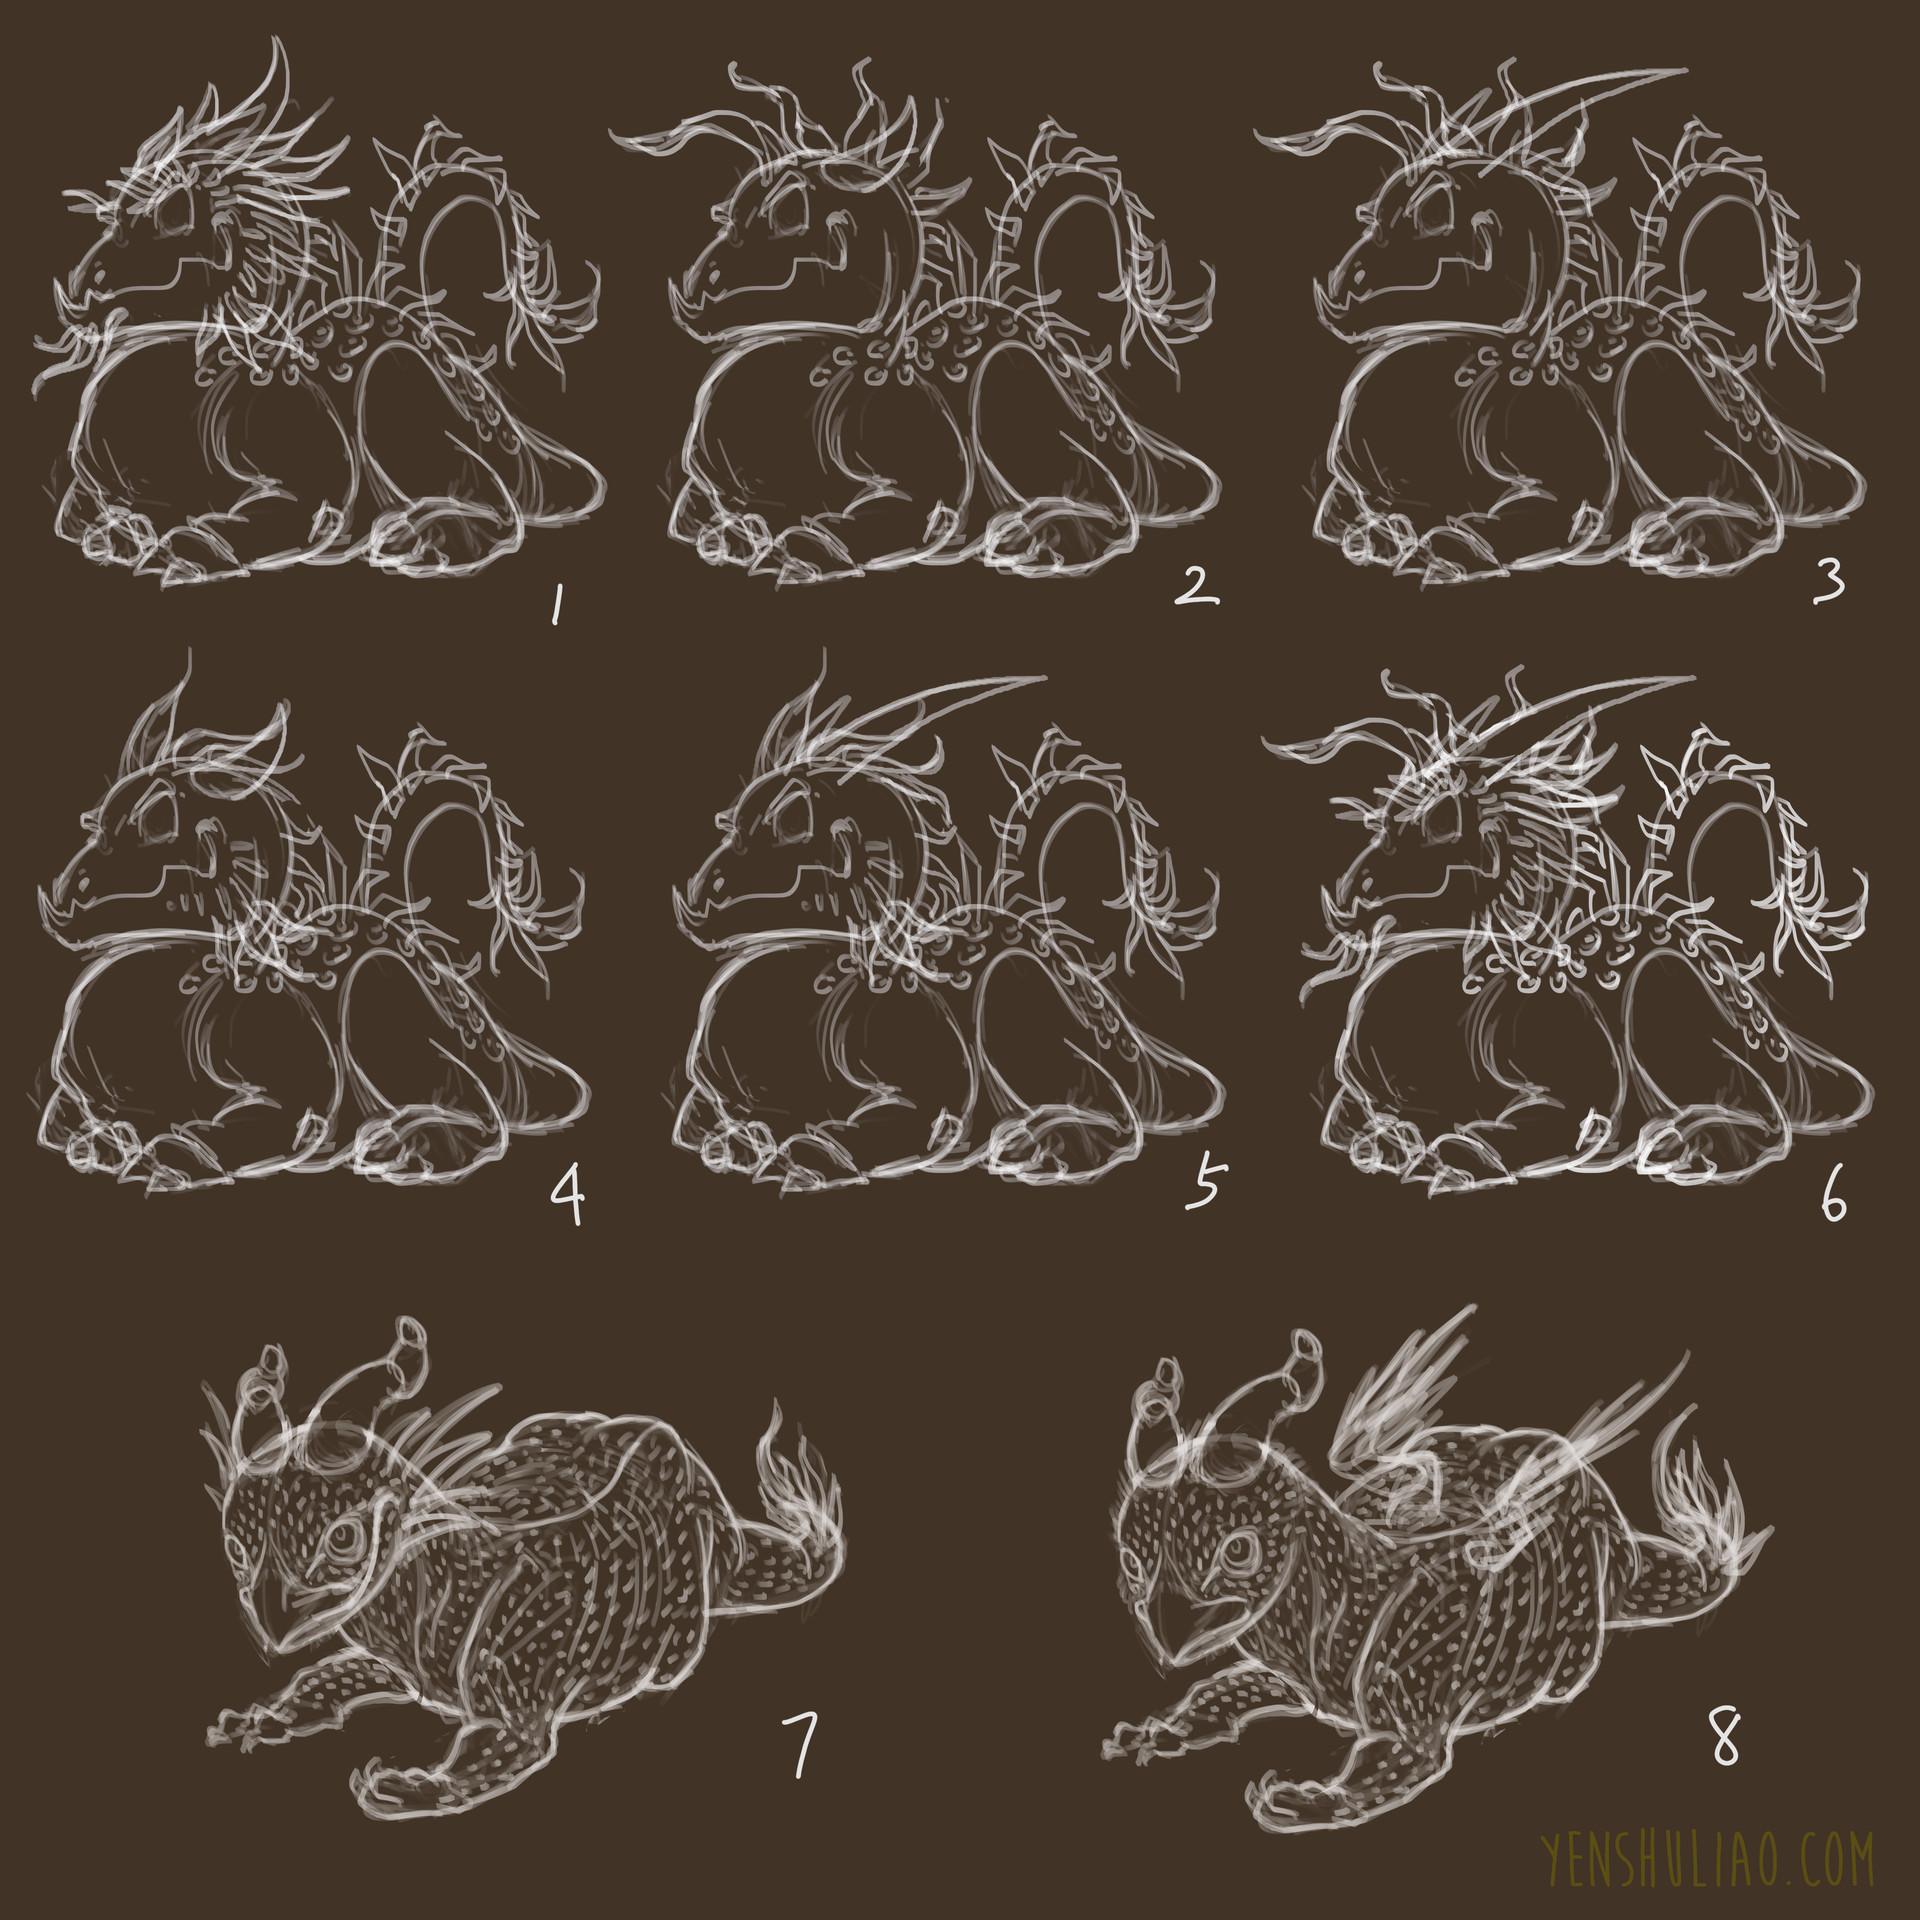 Yen shu liao creature concept strawberry dragon wip